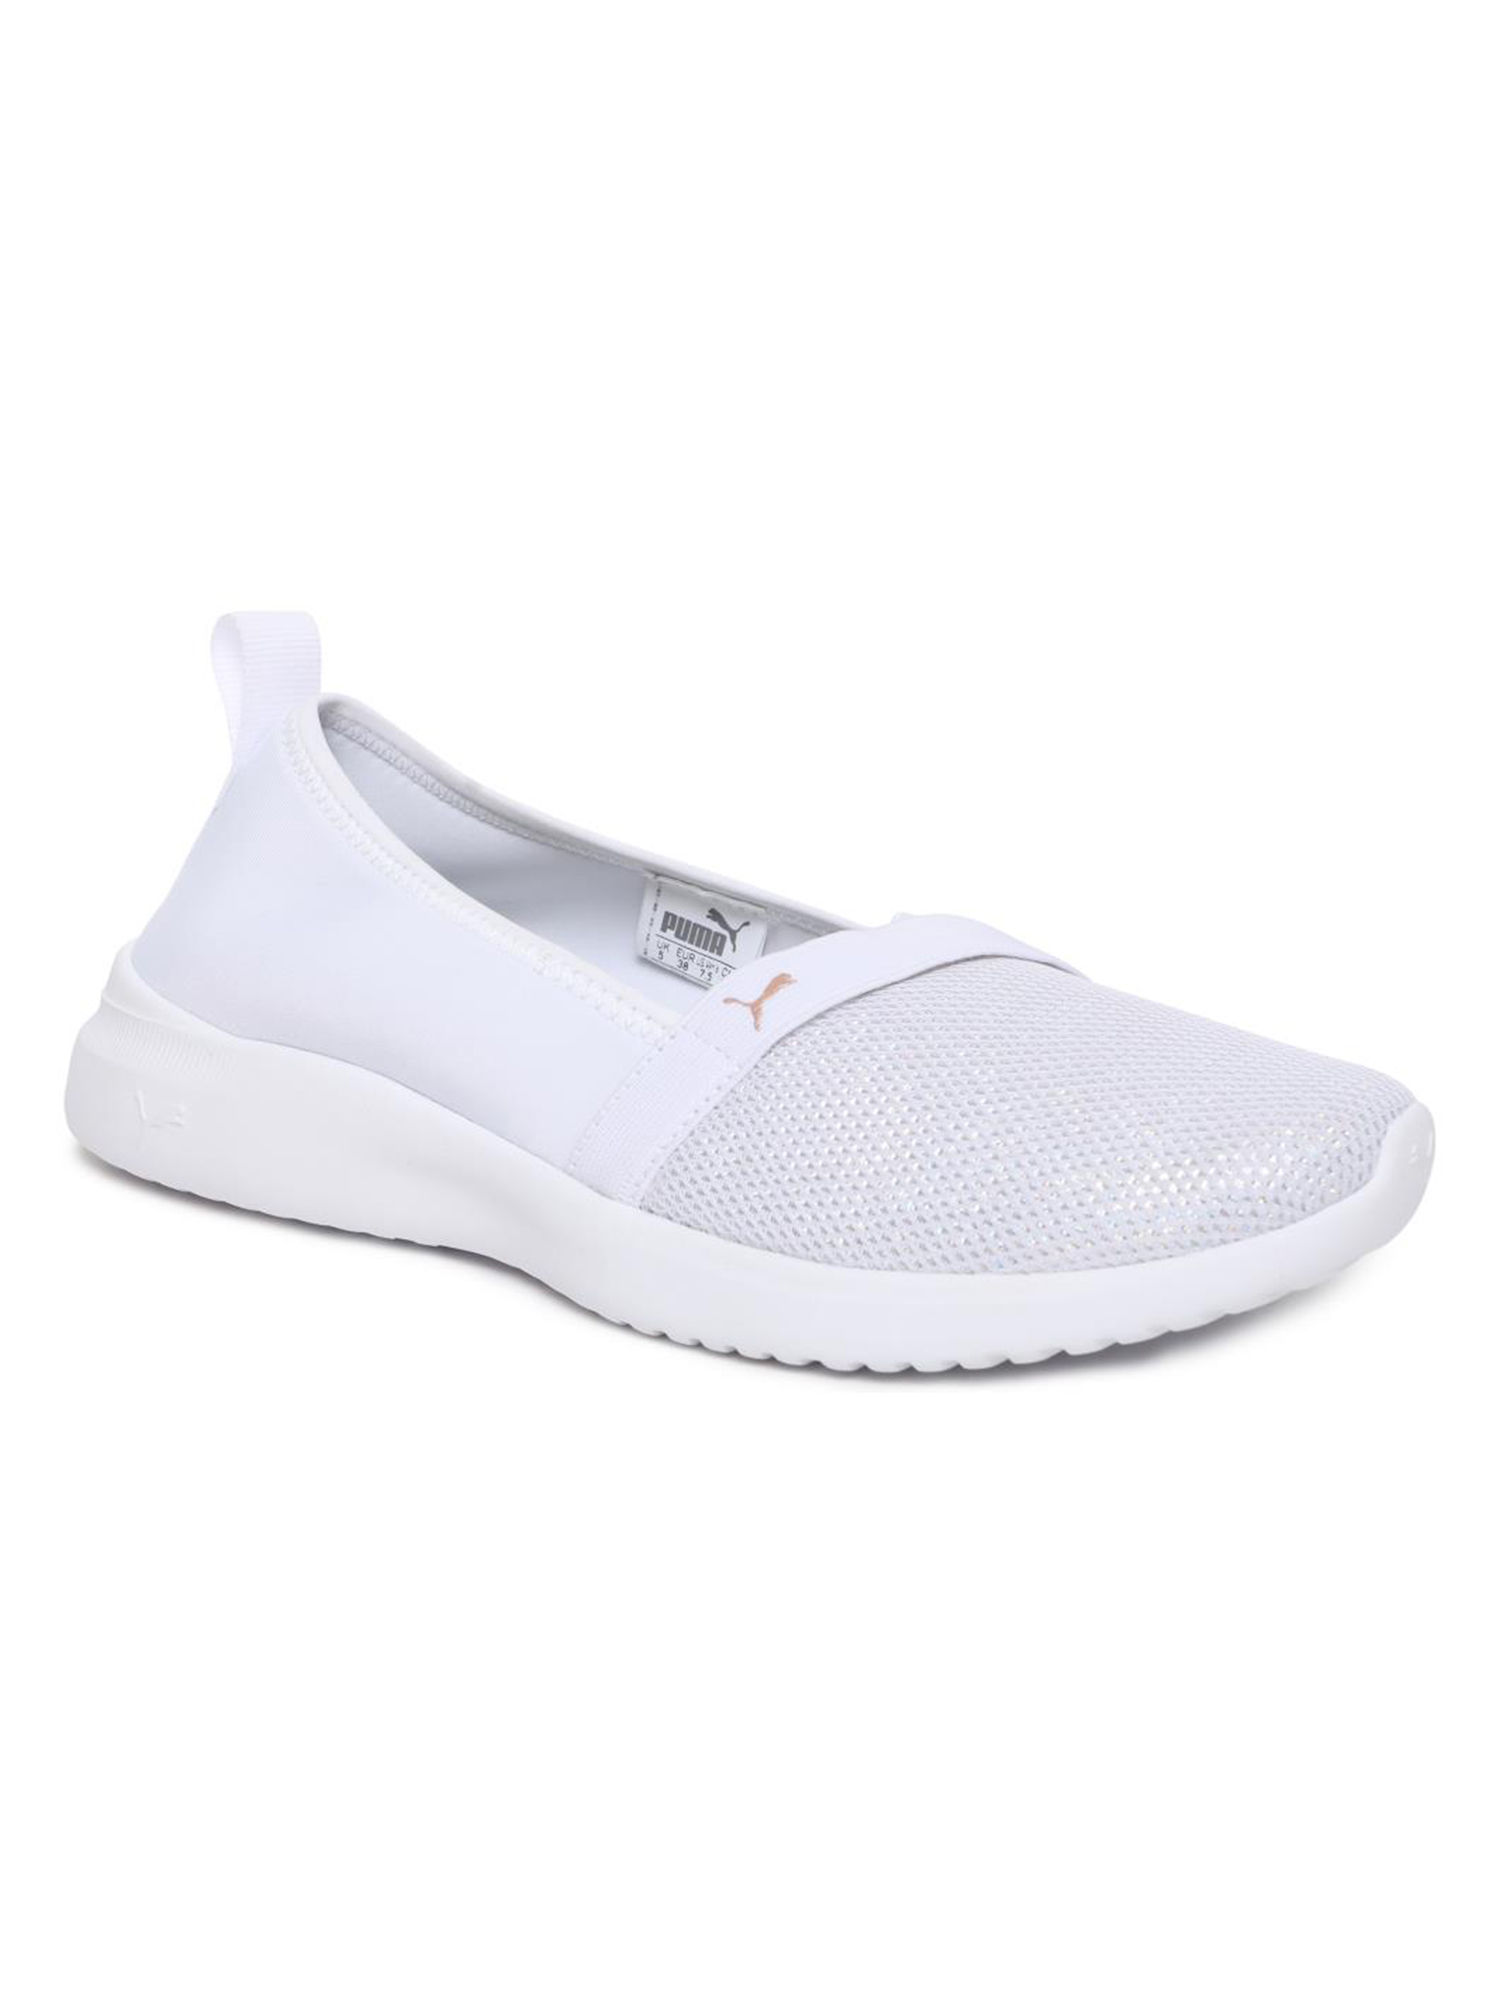 Puma Adelina Sparkle Women Casual Shoes